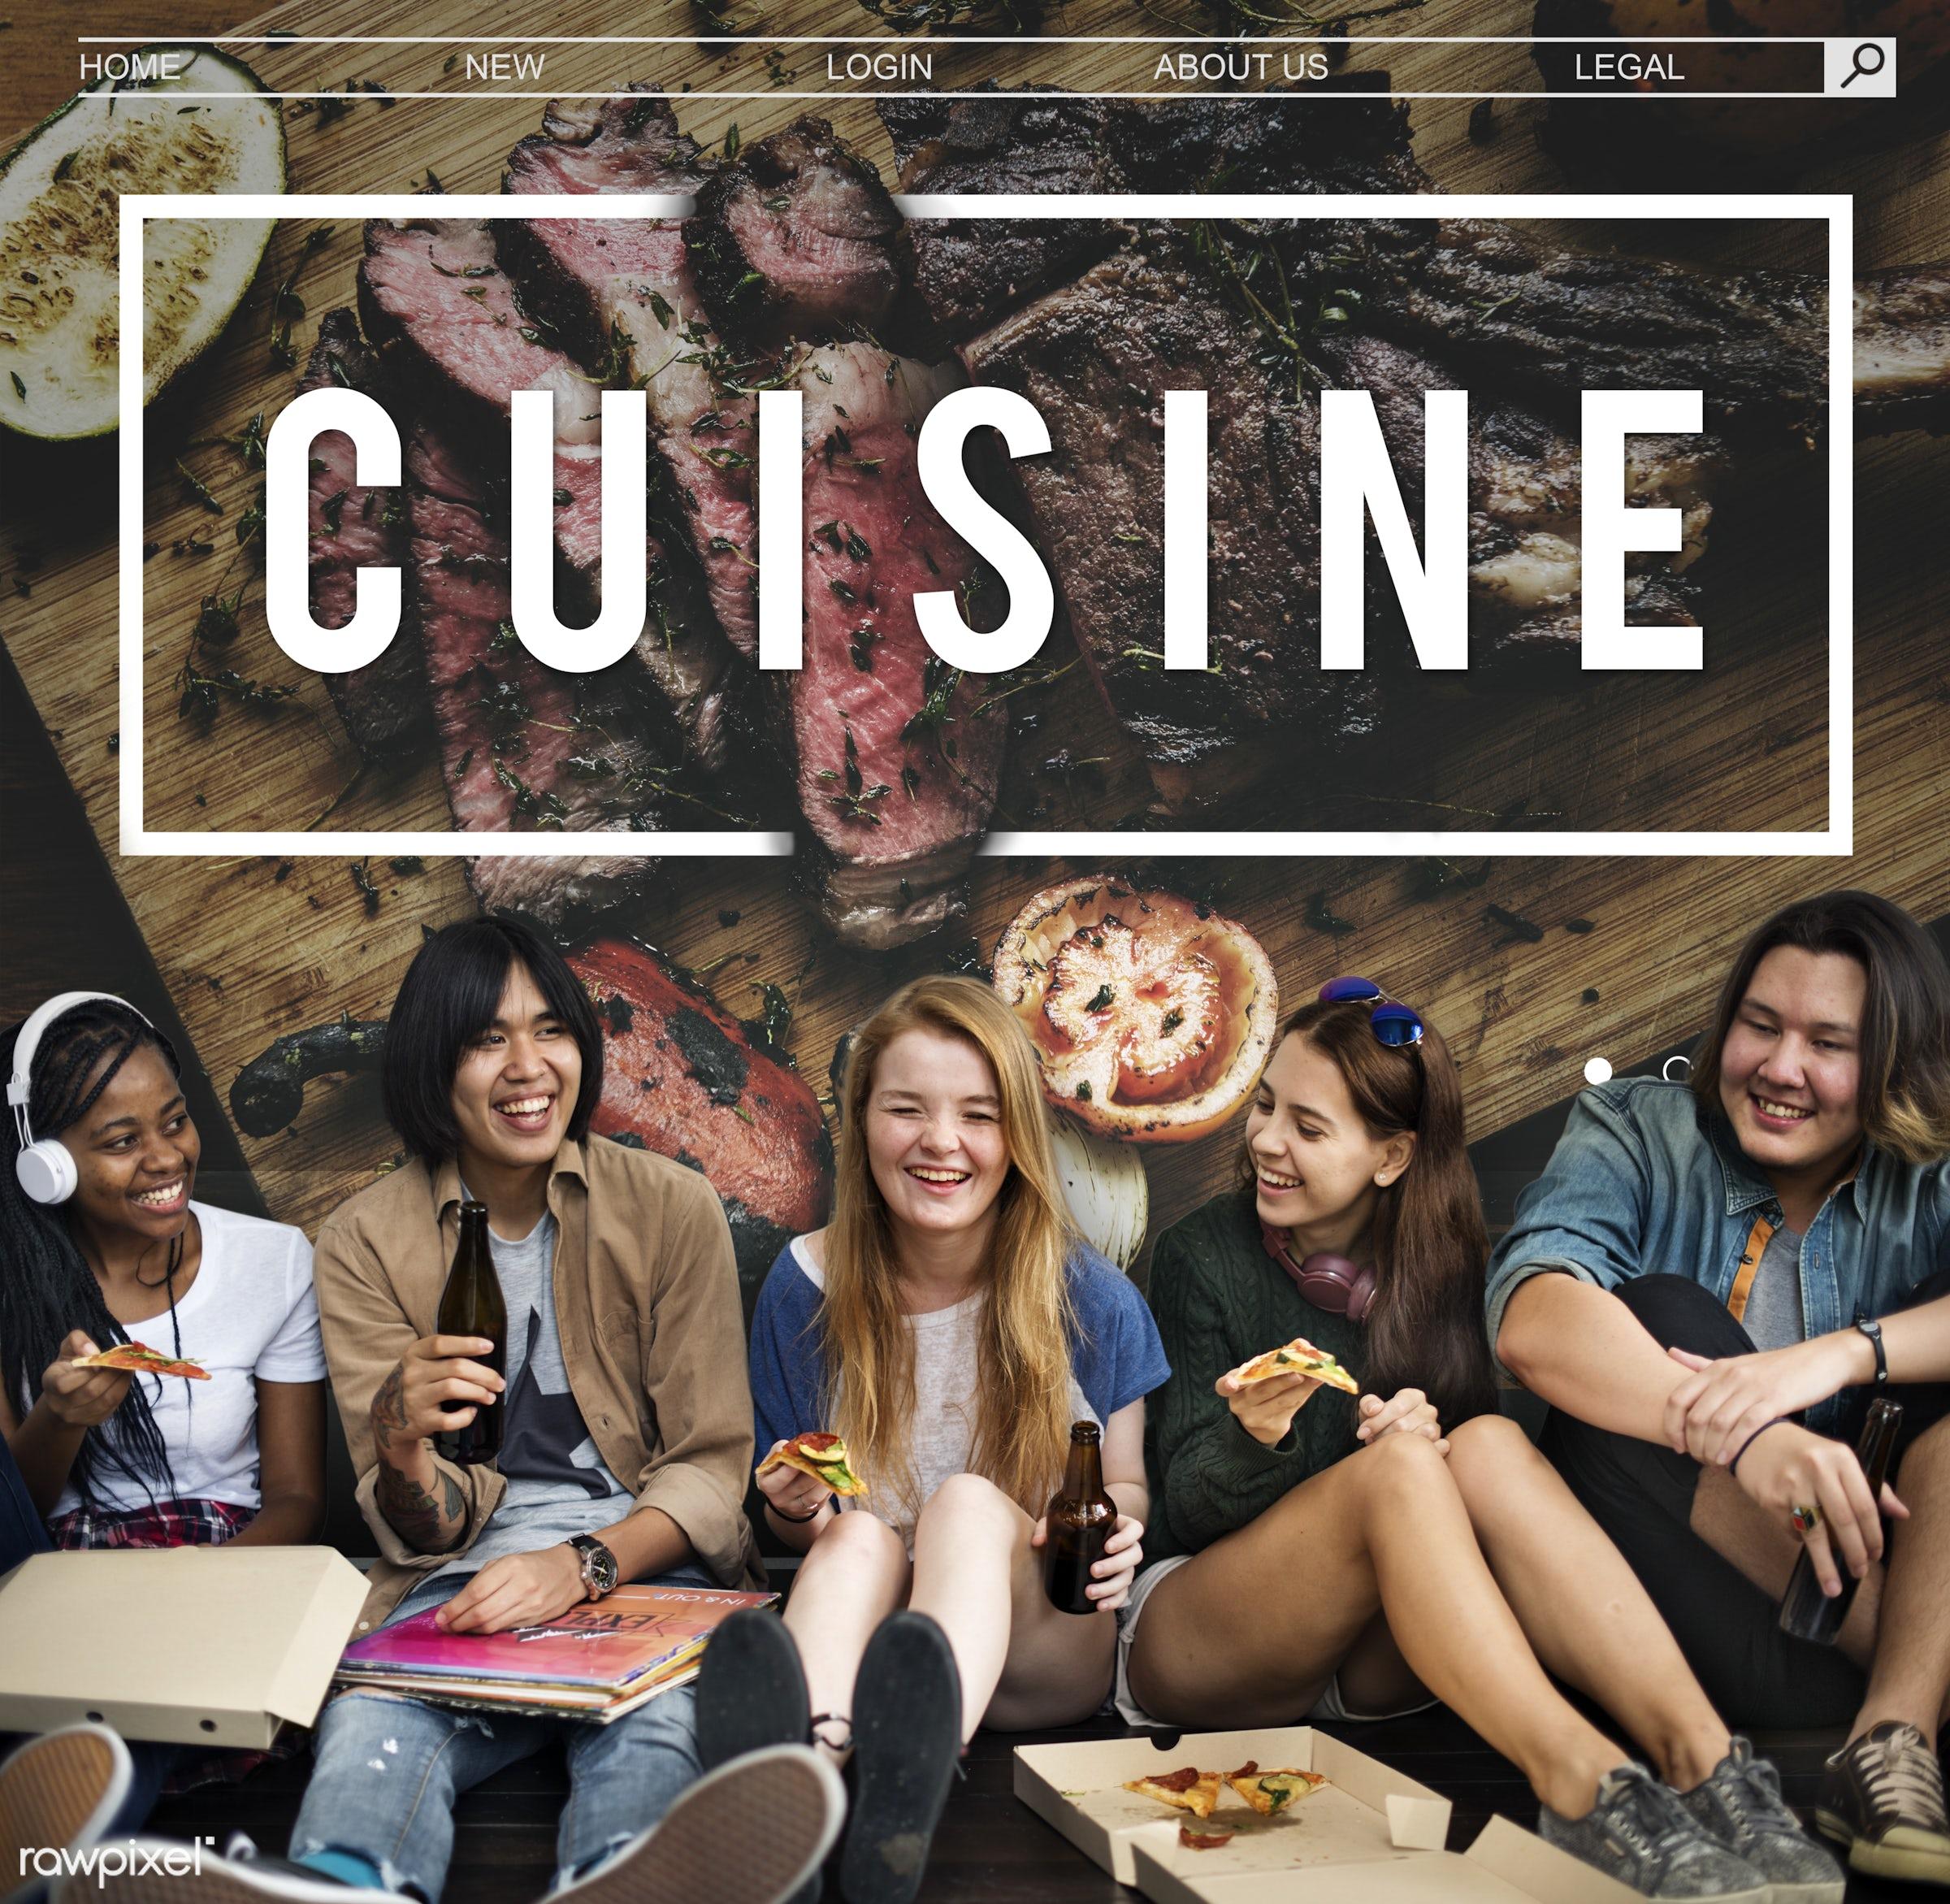 african descent, appetite, asian, calories, caucasian, cuisine, delicious, diet, dining, dinner, diversity, drinking, eat...